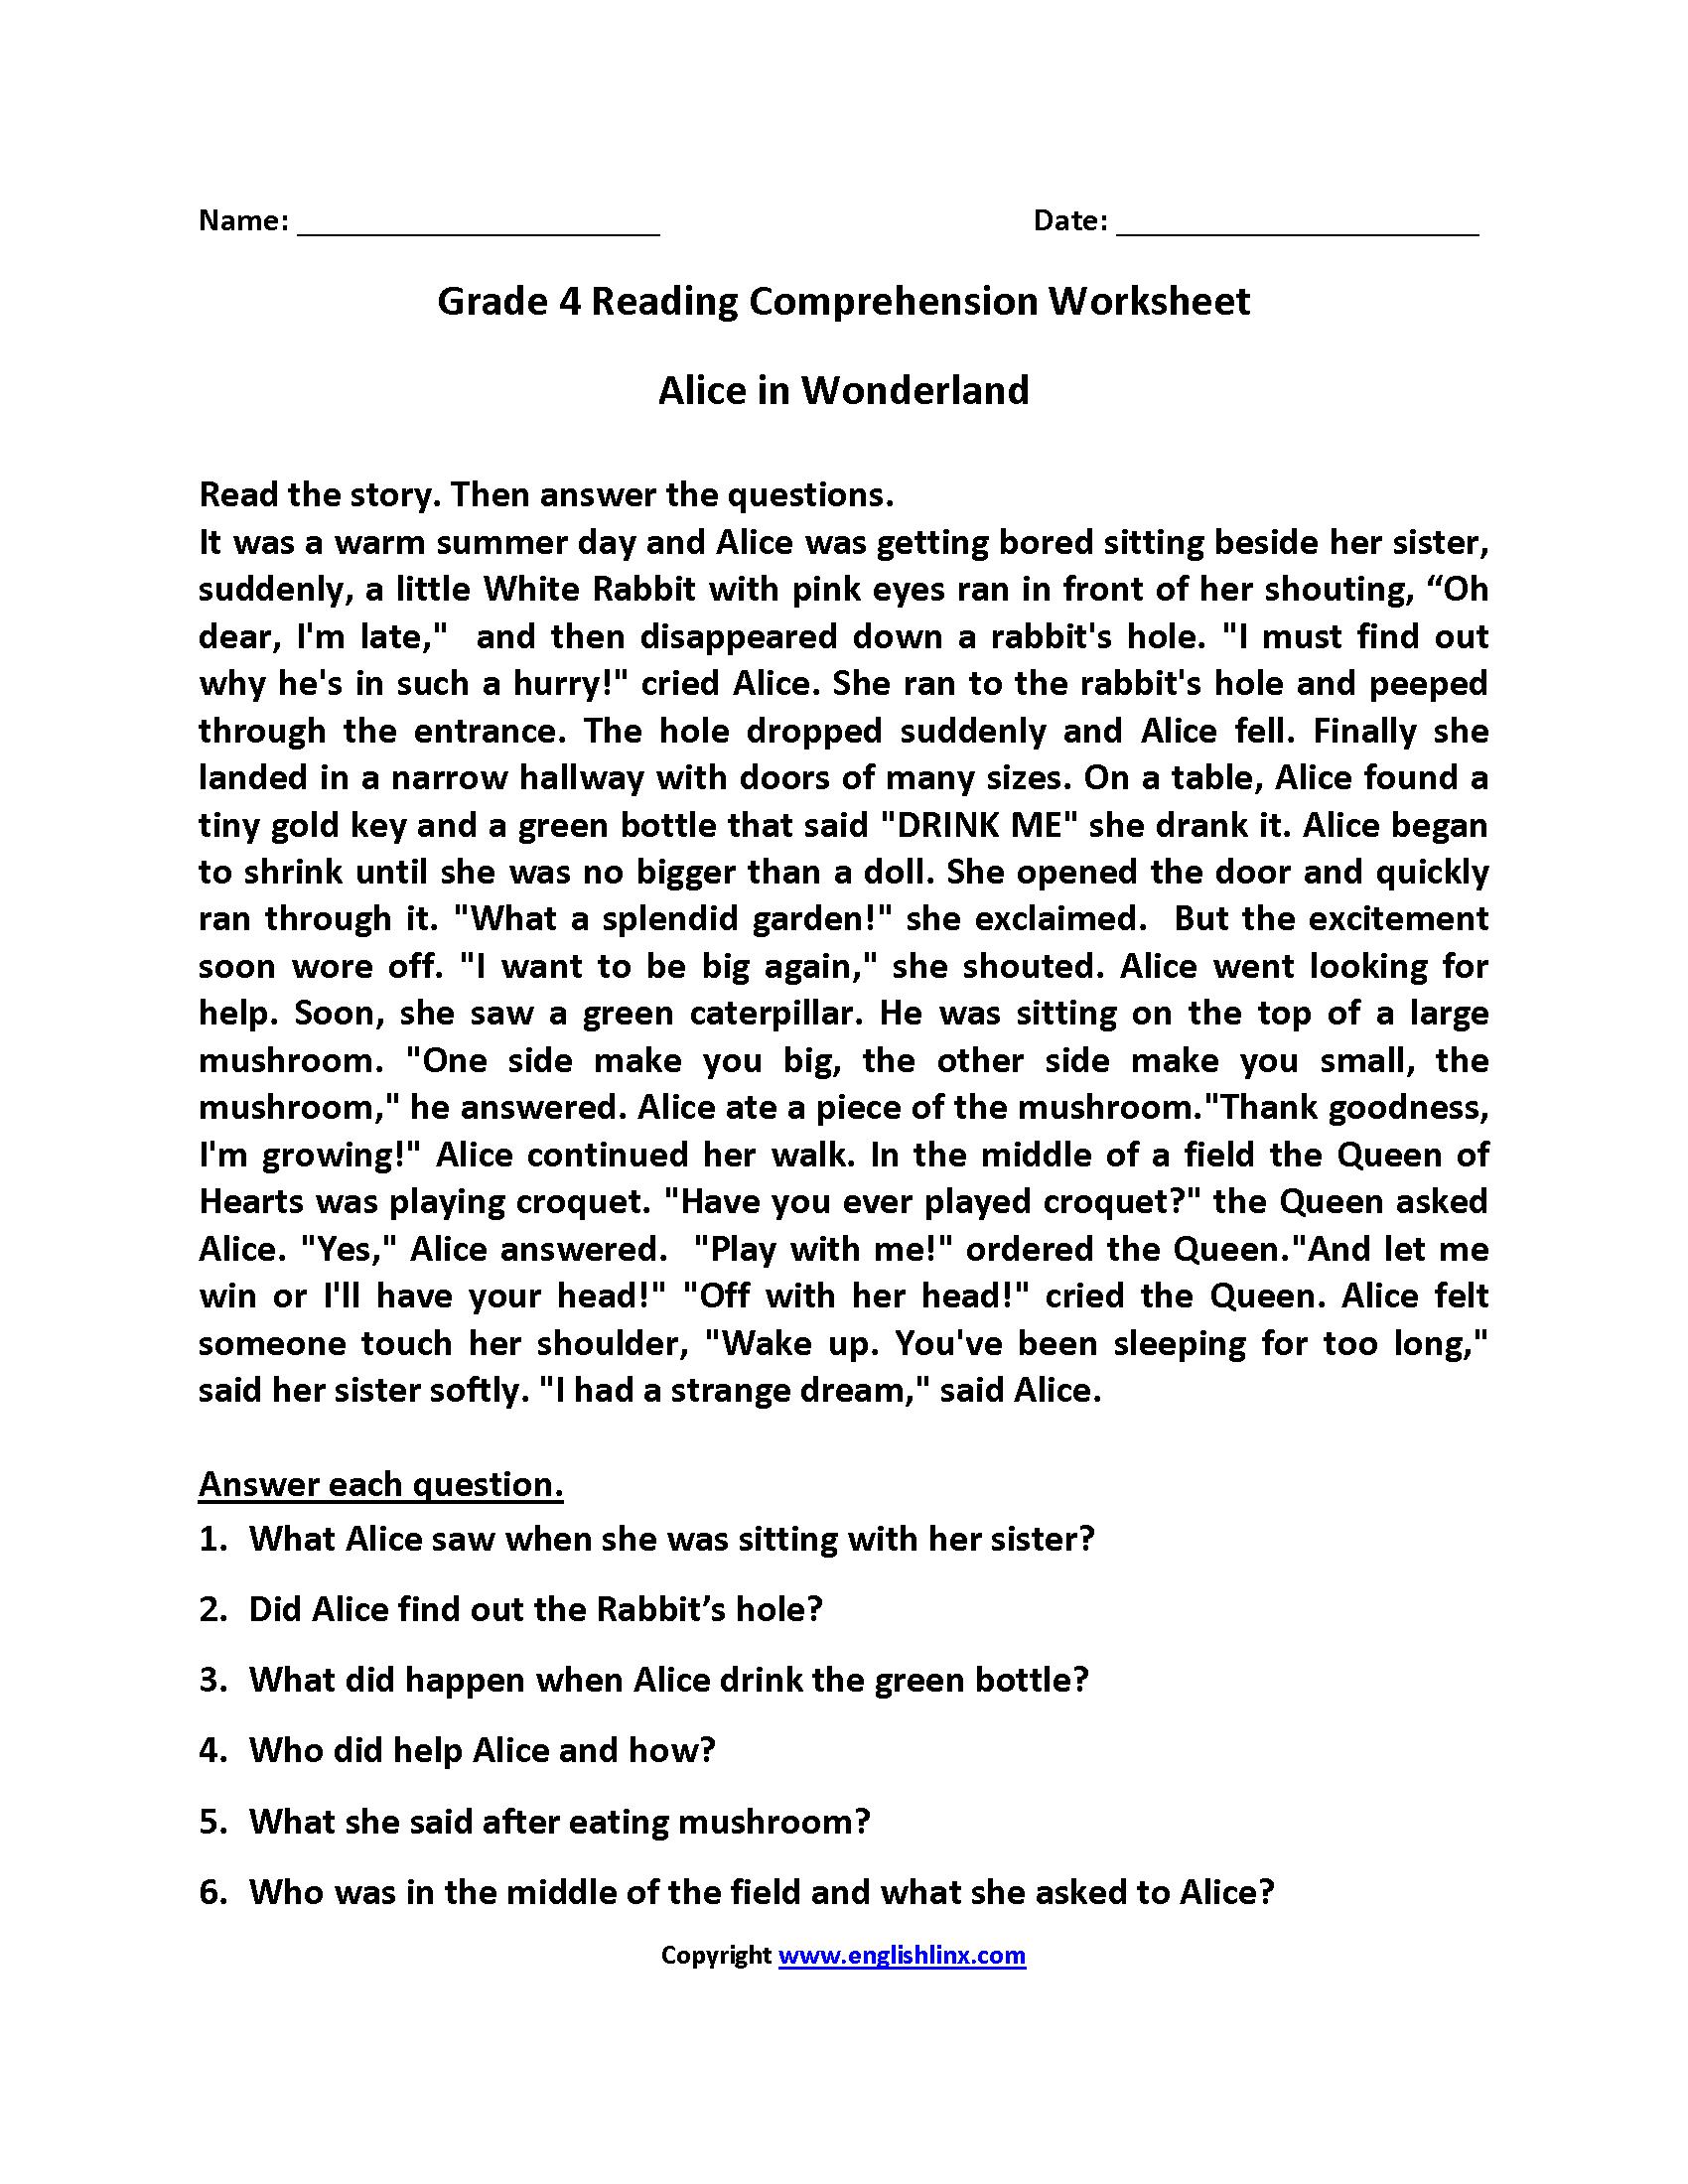 Alice In Wonderland Fourth Grade Reading Worksheets | Esl - Free Printable 4Th Grade Reading Worksheets